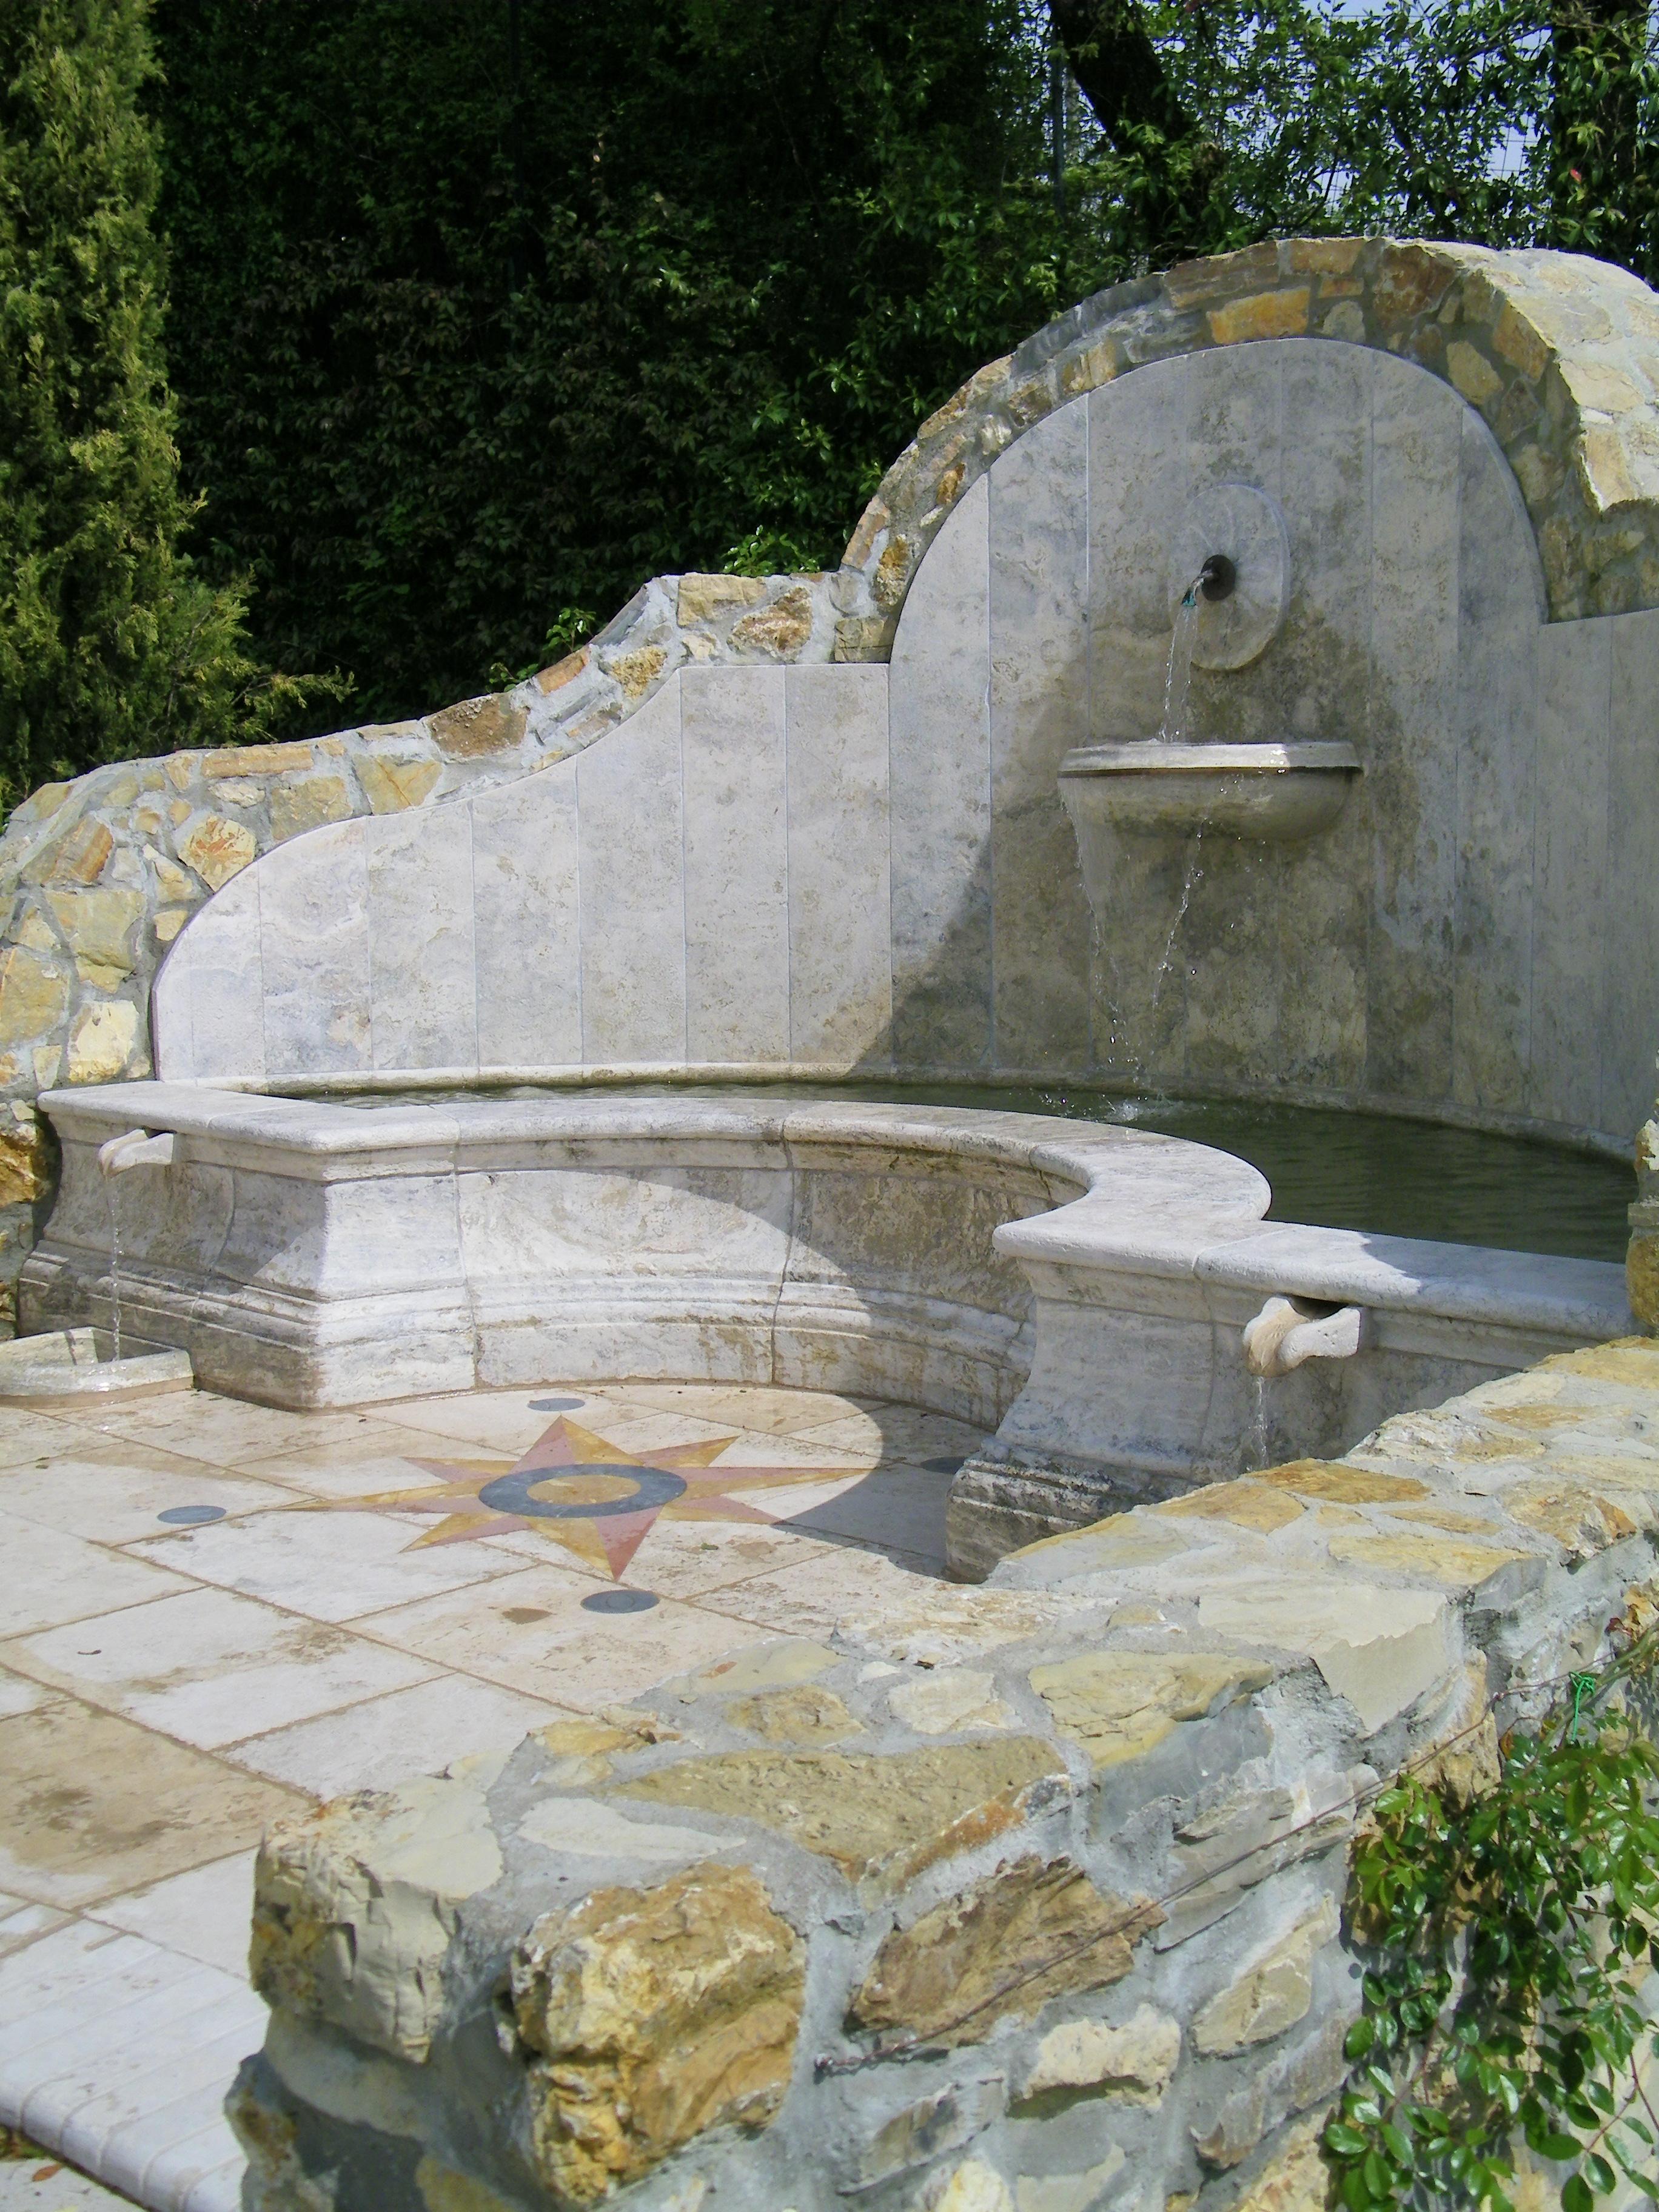 Pietra e acqua uno sguardo alle fontane garden house lazzerini - Fontane da casa ...